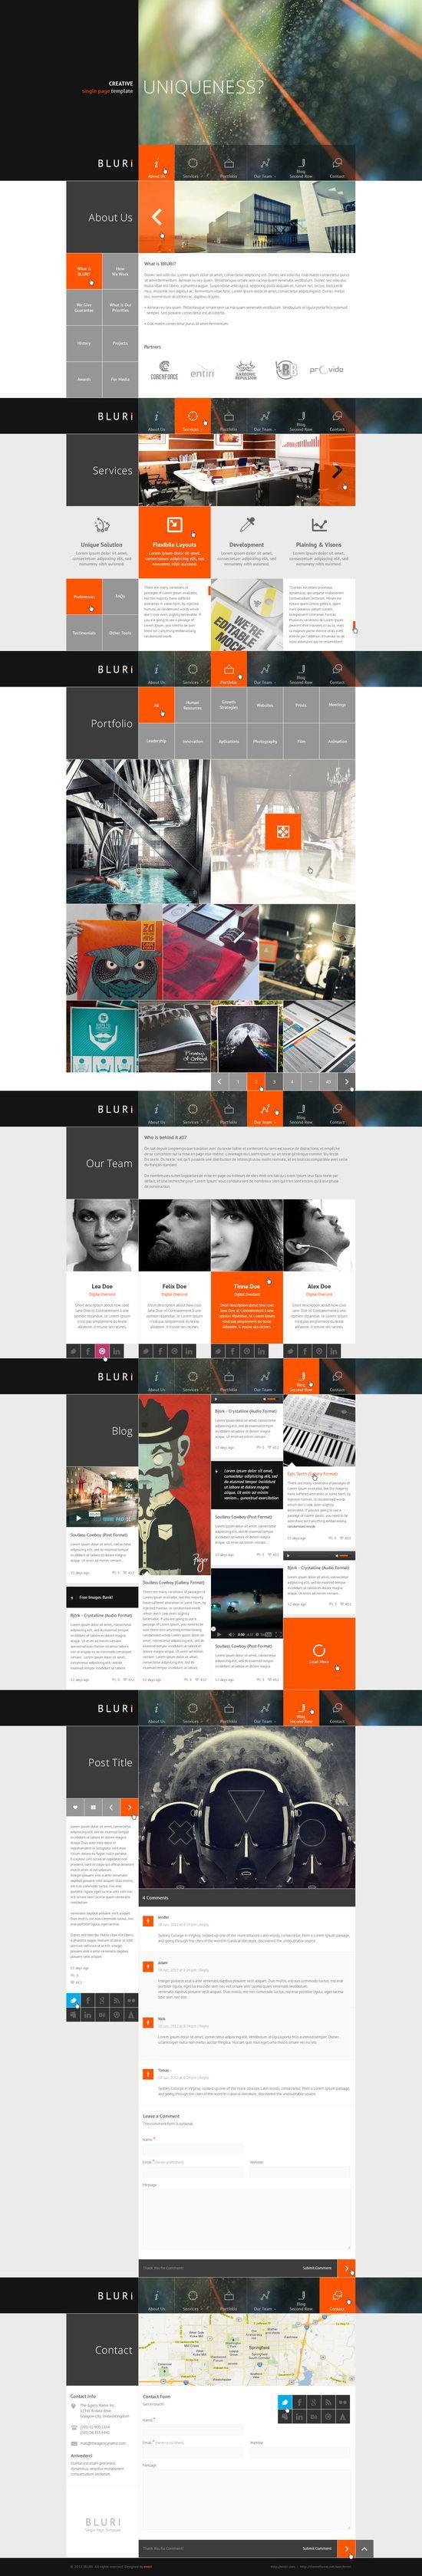 BLURI Single Page web | http://amazingwebdesignideas.blogspot.com